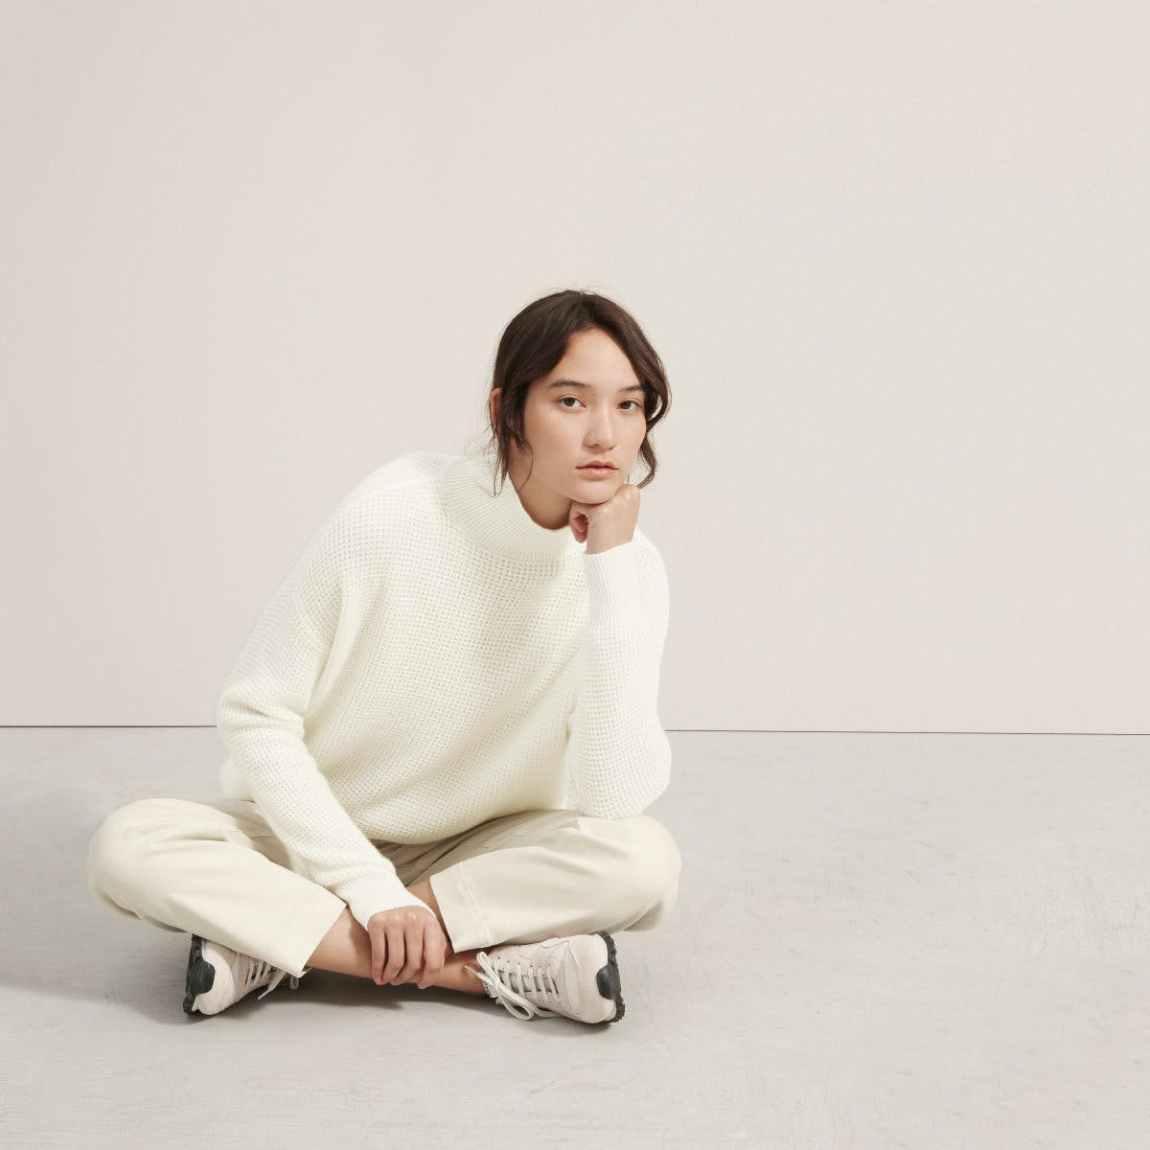 everlane, everlane knit, waffle knit sweater, knit sweater, trutleneck, sweater, white knit sweater, denimblog, denim blog